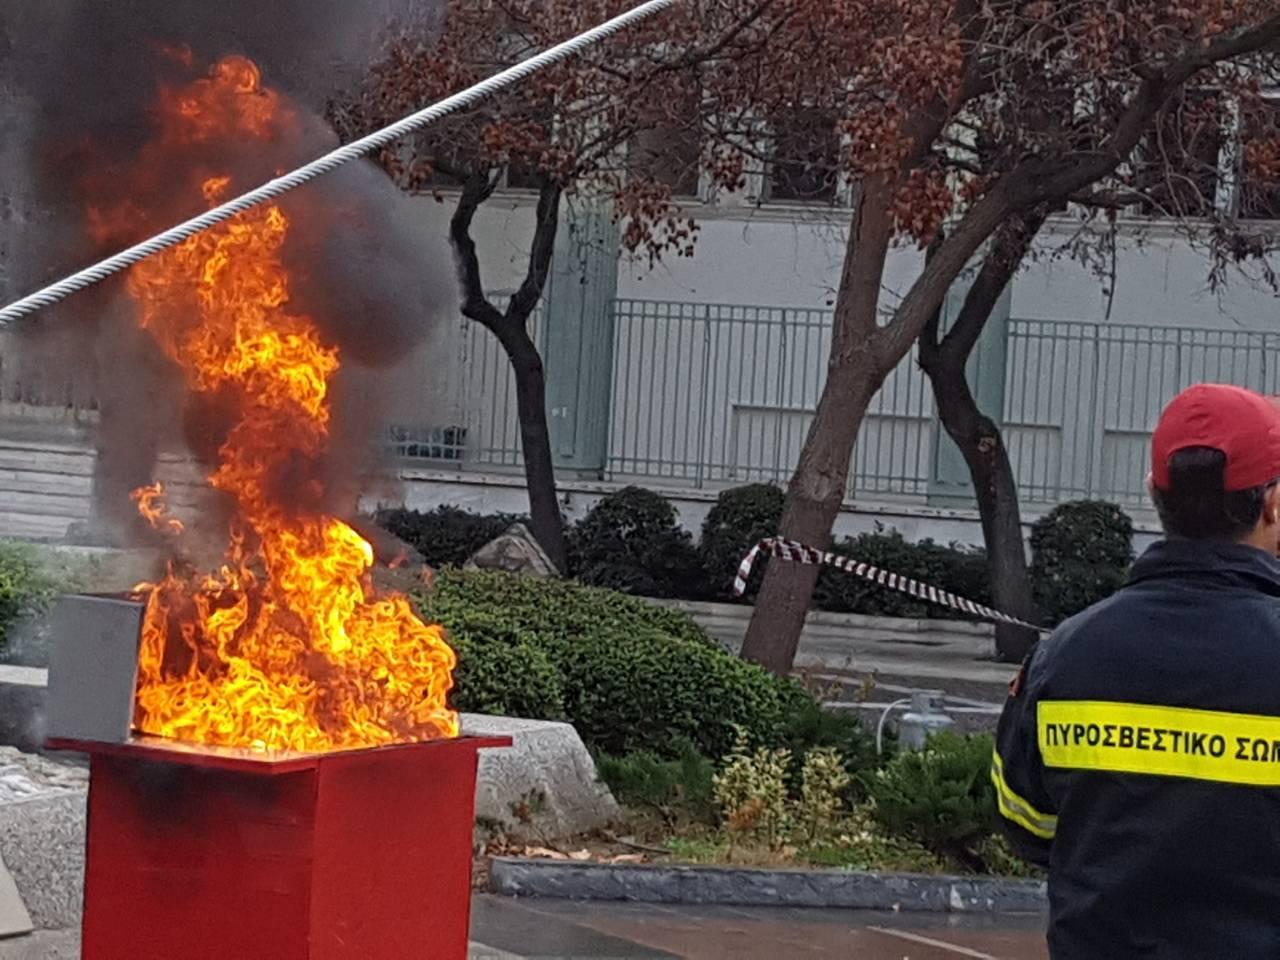 madenlidis pyrosvestikis 23 - O Σεβασμιώτατος ευλόγησε την εντυπωσιακή επίδειξη από την Πυροσβεστικής Υπηρεσίας Λάρισας